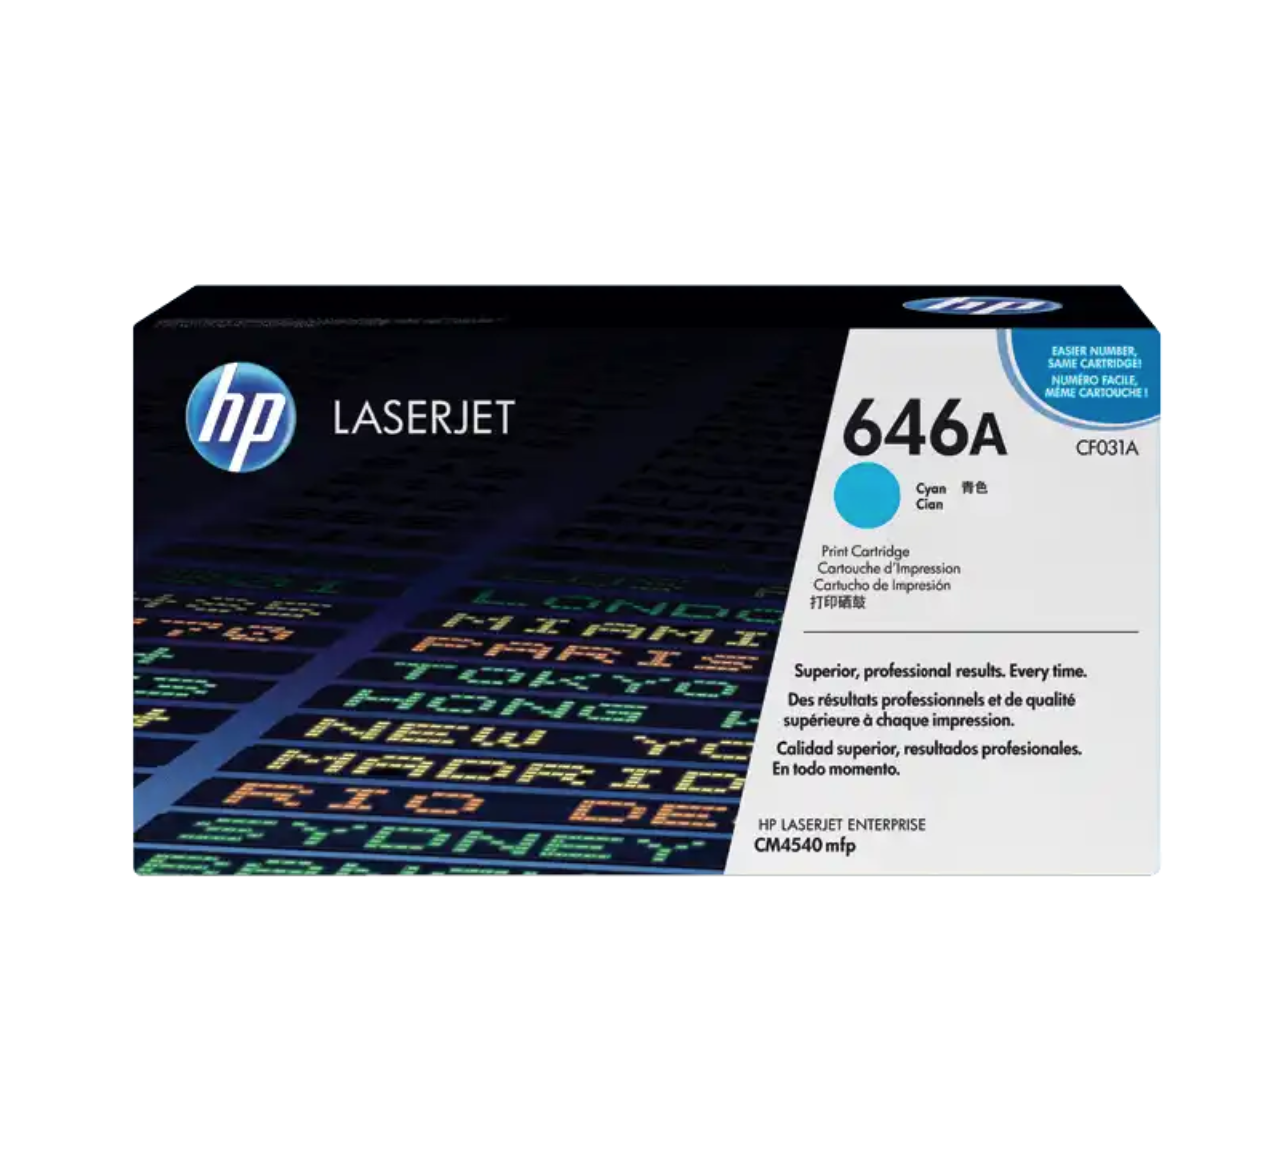 HP 646A 綻藍原廠 LaserJet 碳粉 CF031A